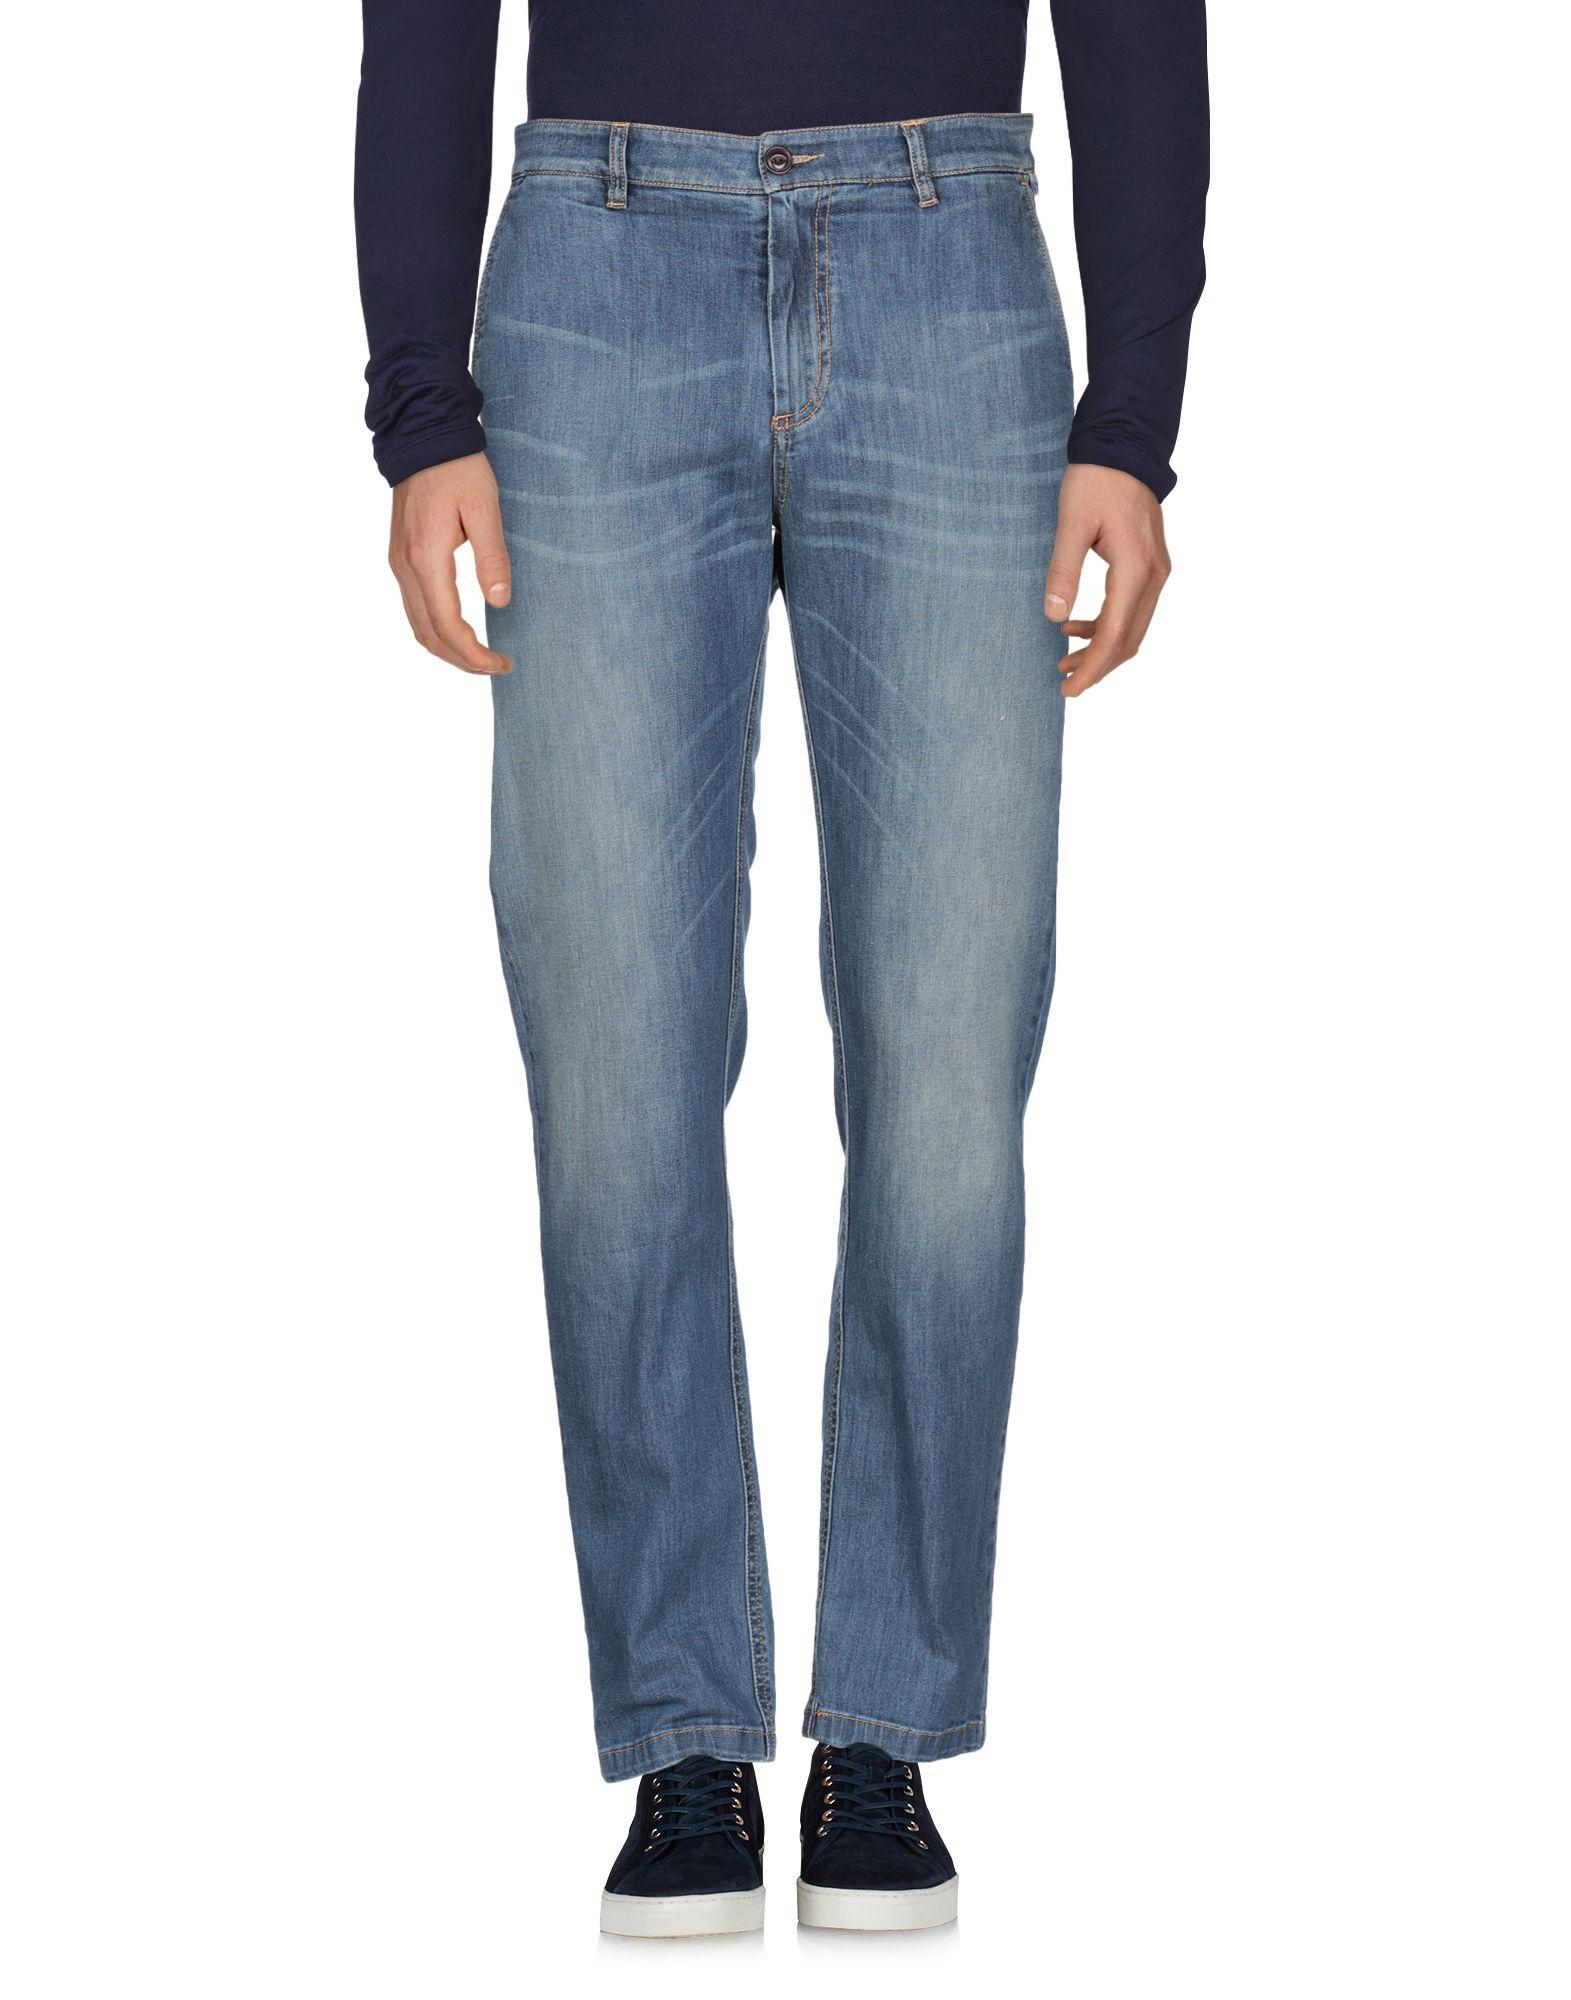 best sneakers 13587 0e9a8 Franklin & Marshall Denim Trousers - Men Franklin & Marshall ...